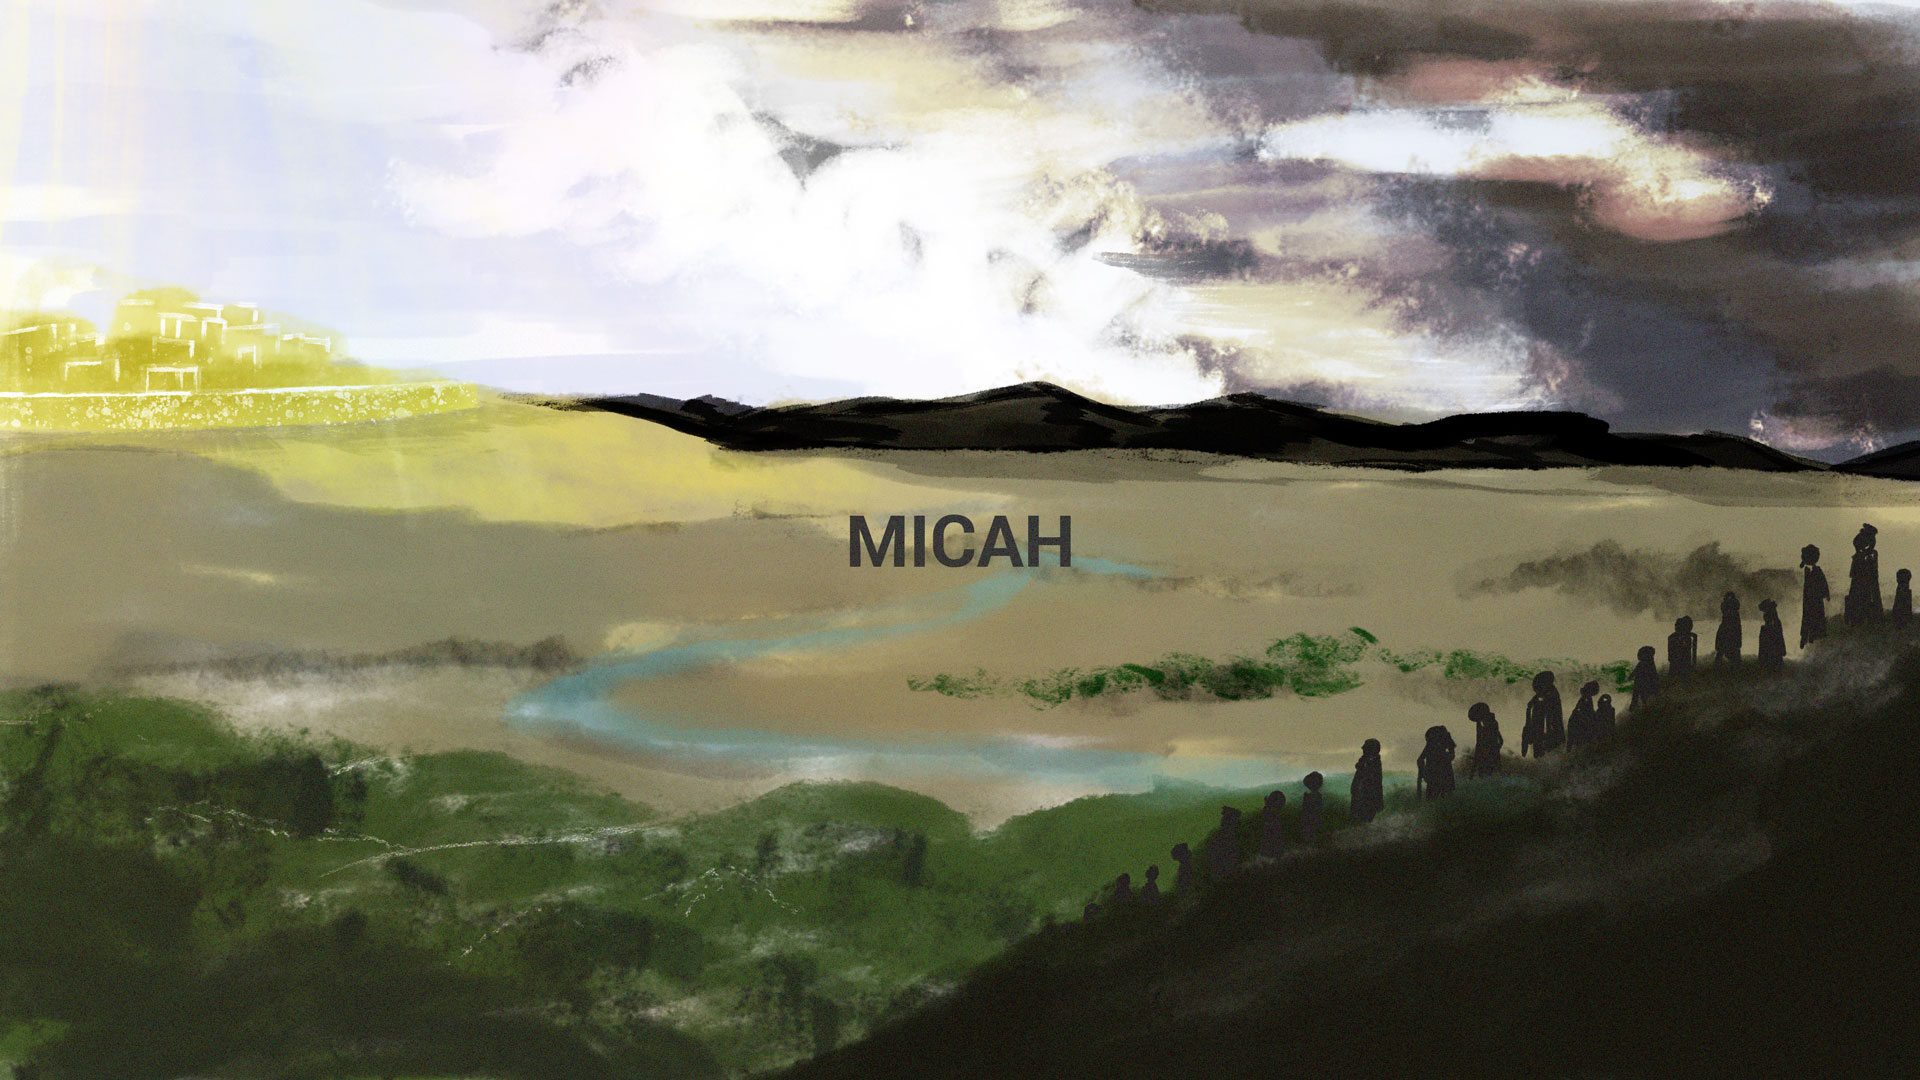 micah_1_main.jpg